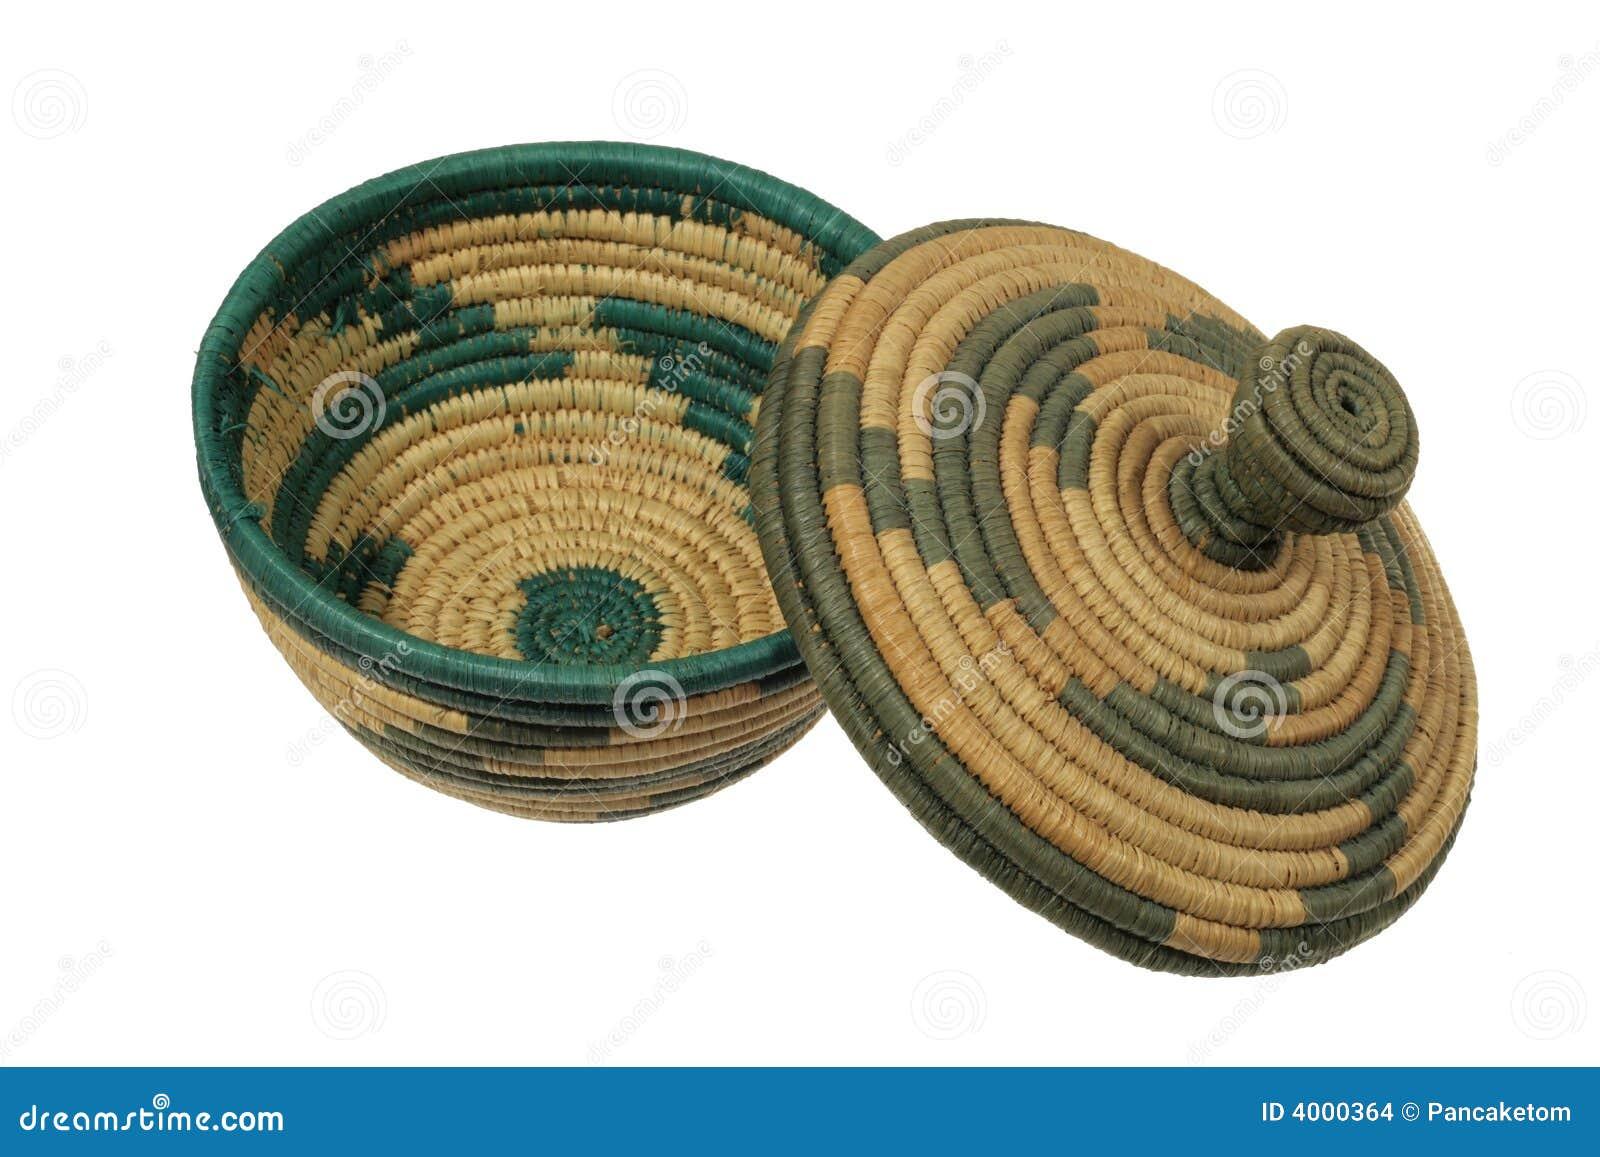 Voodoo amulet royalty free stock photos image 2718528 - Afrikaanse Mand Met Deksel Stock Afbeeldingen